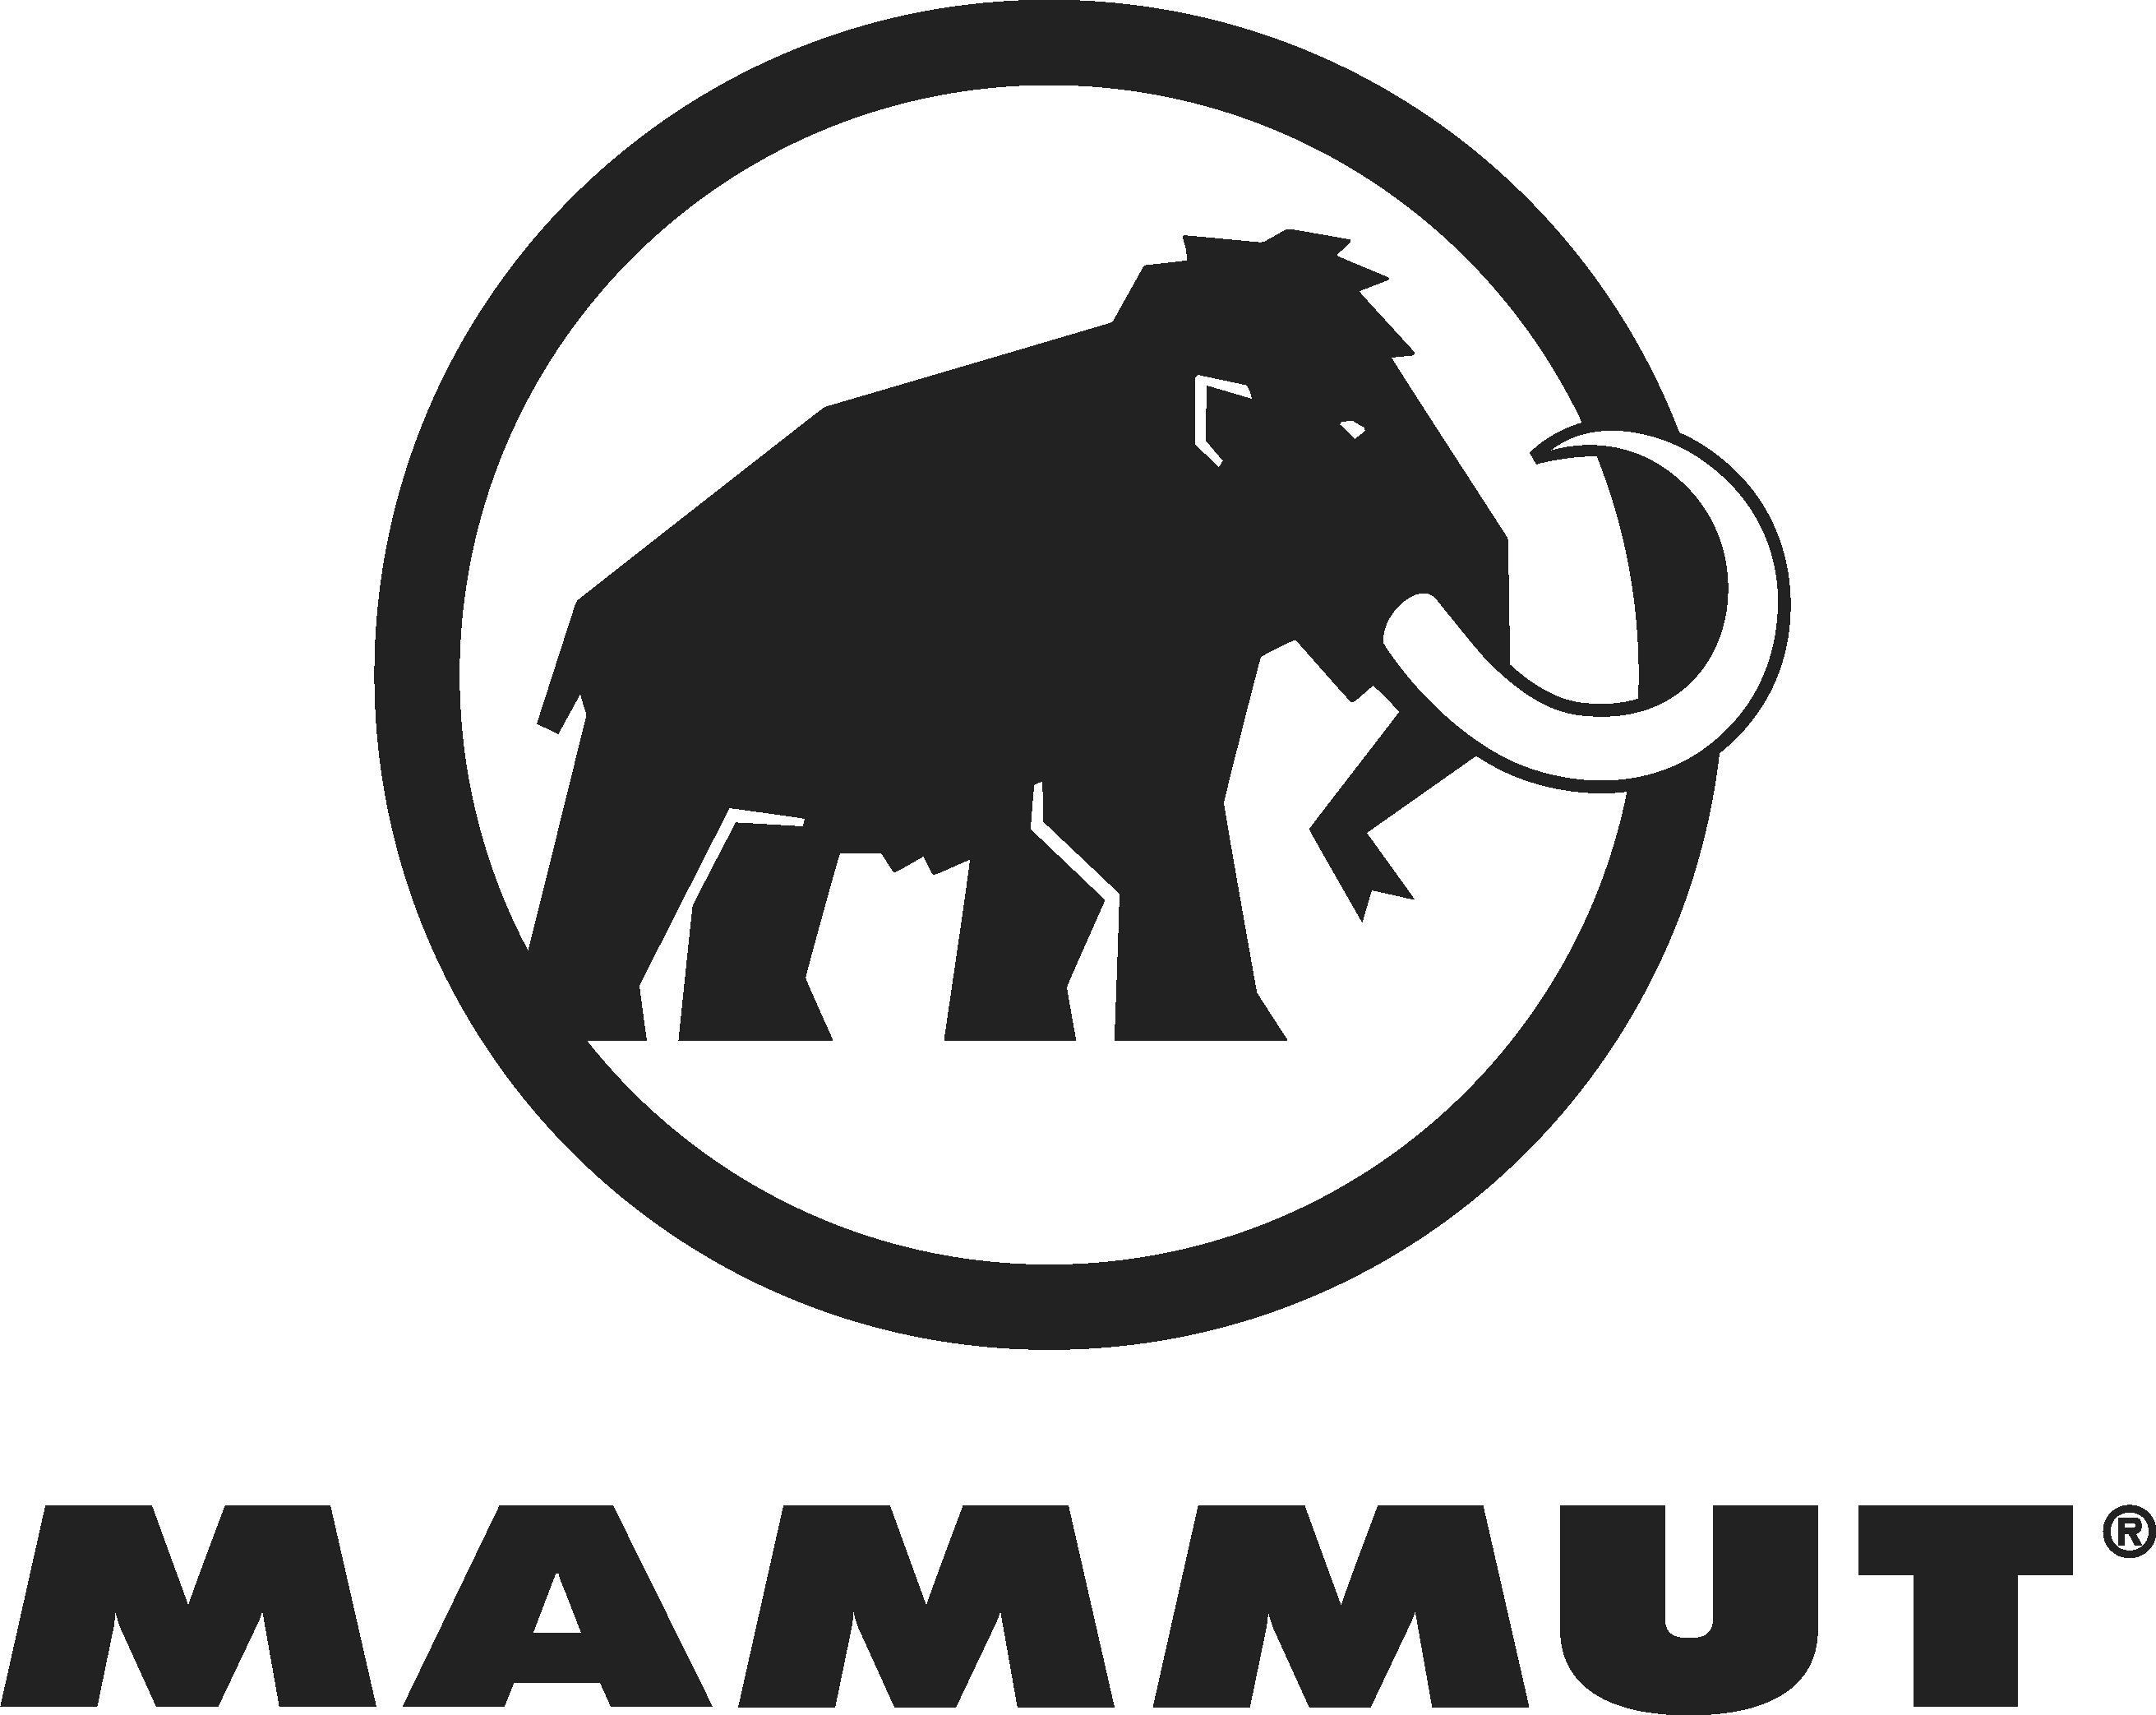 logo.png (2623×2086) 의류